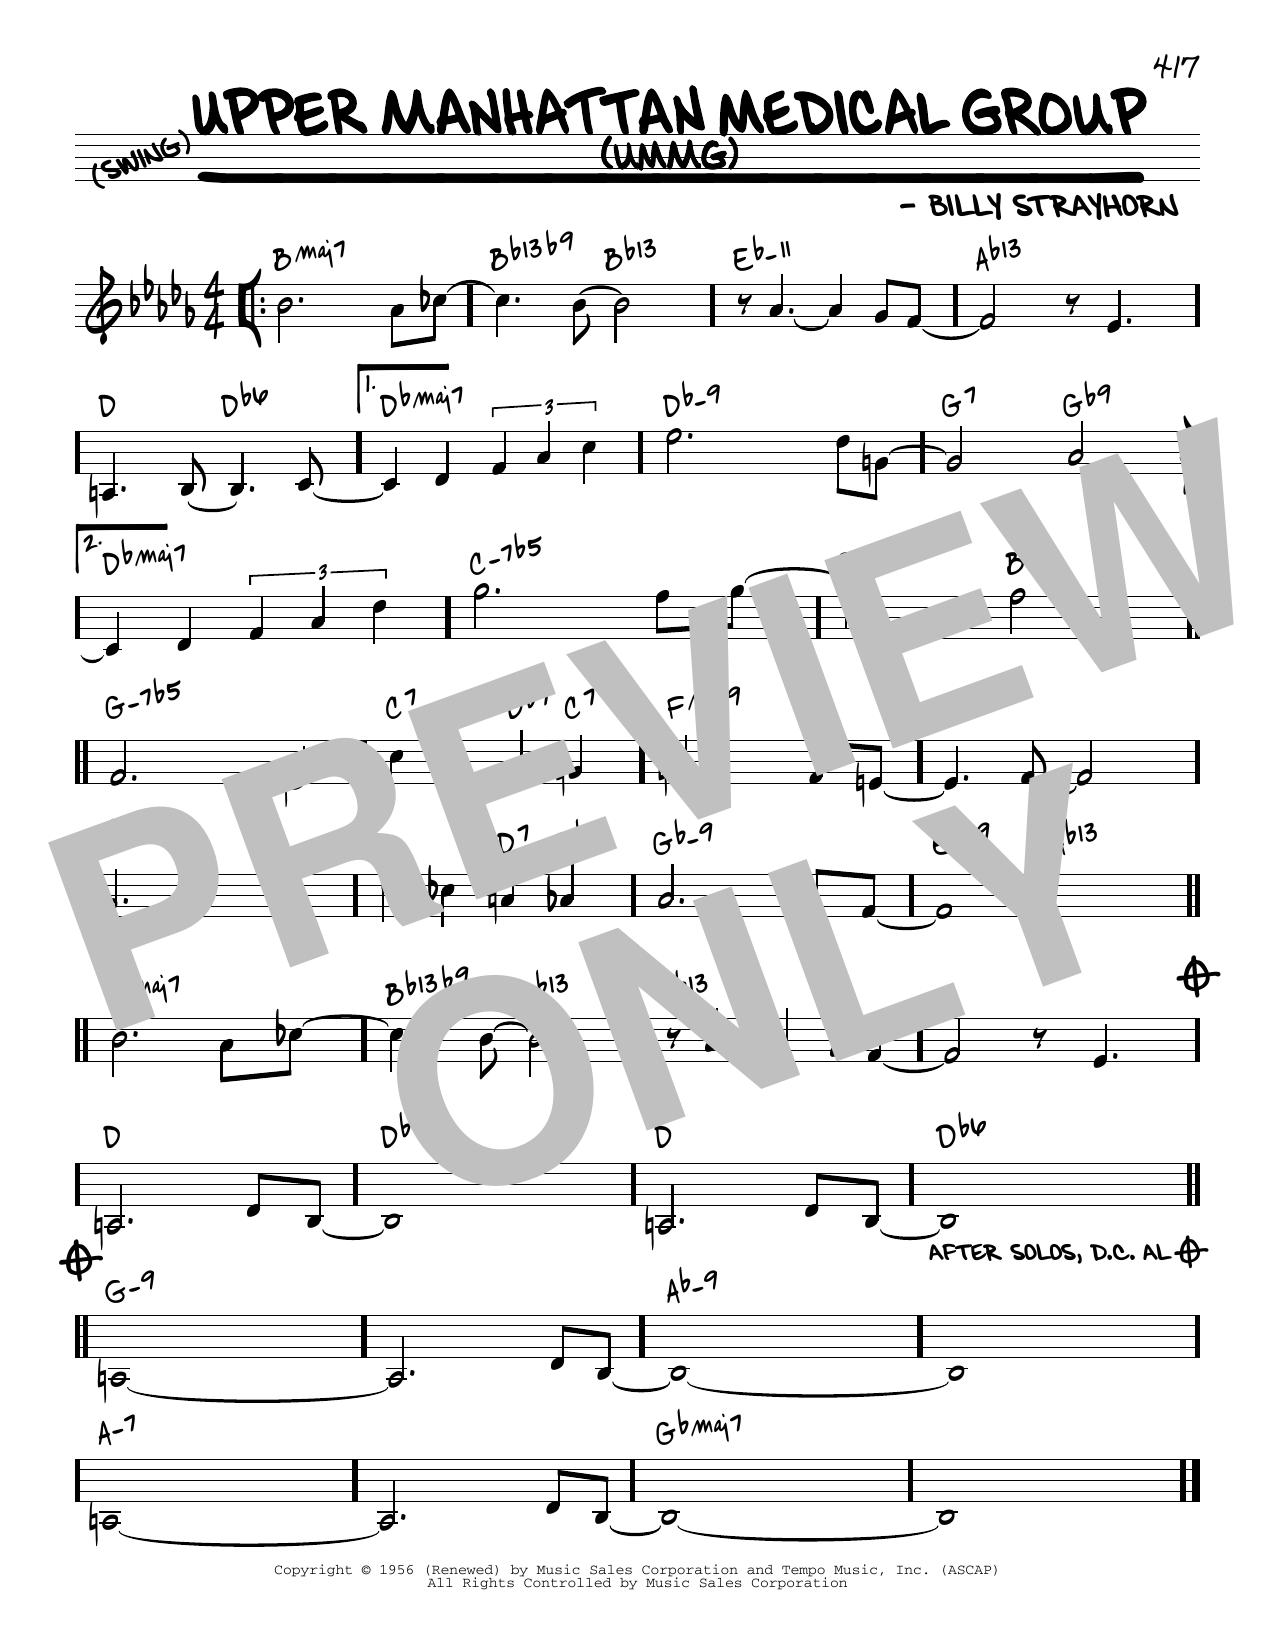 Billy Strayhorn Upper Manhattan Medical Group (UMMG) [Reharmonized version] (arr. Jack Grassel) sheet music notes printable PDF score